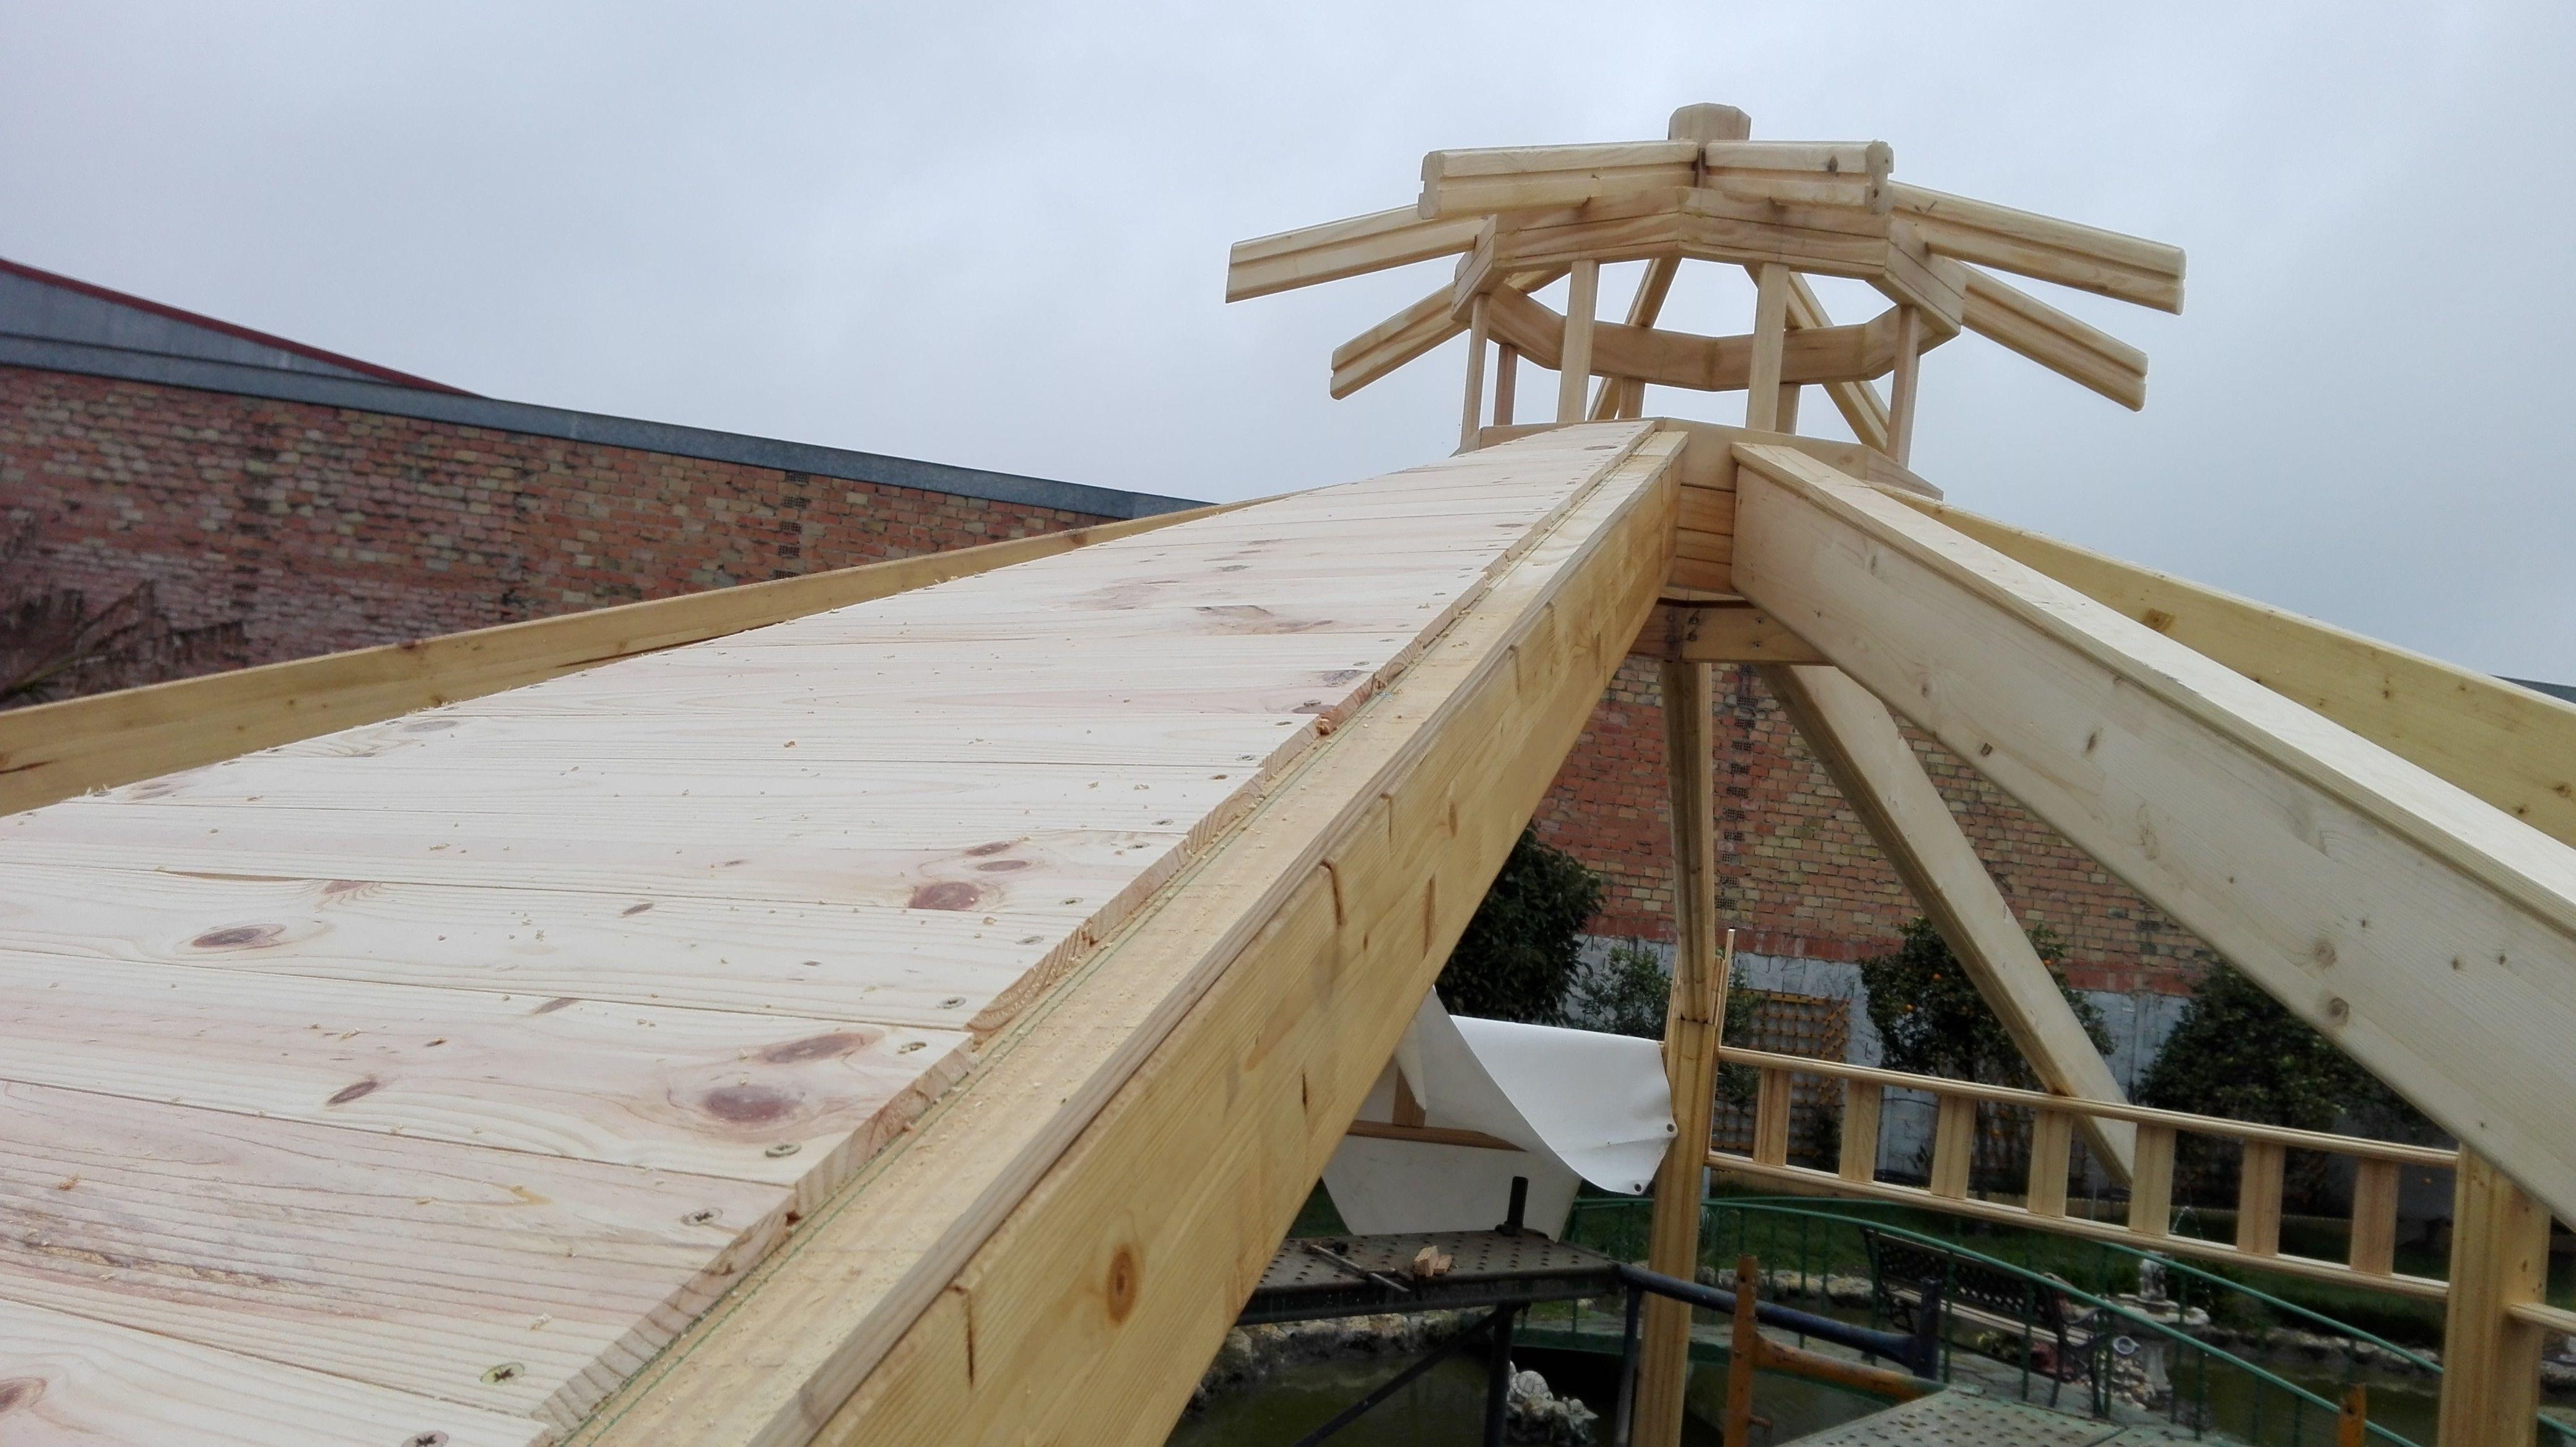 Kiosco octogonal con tejado a 16 aguas de madera tejado for Tejados de madera